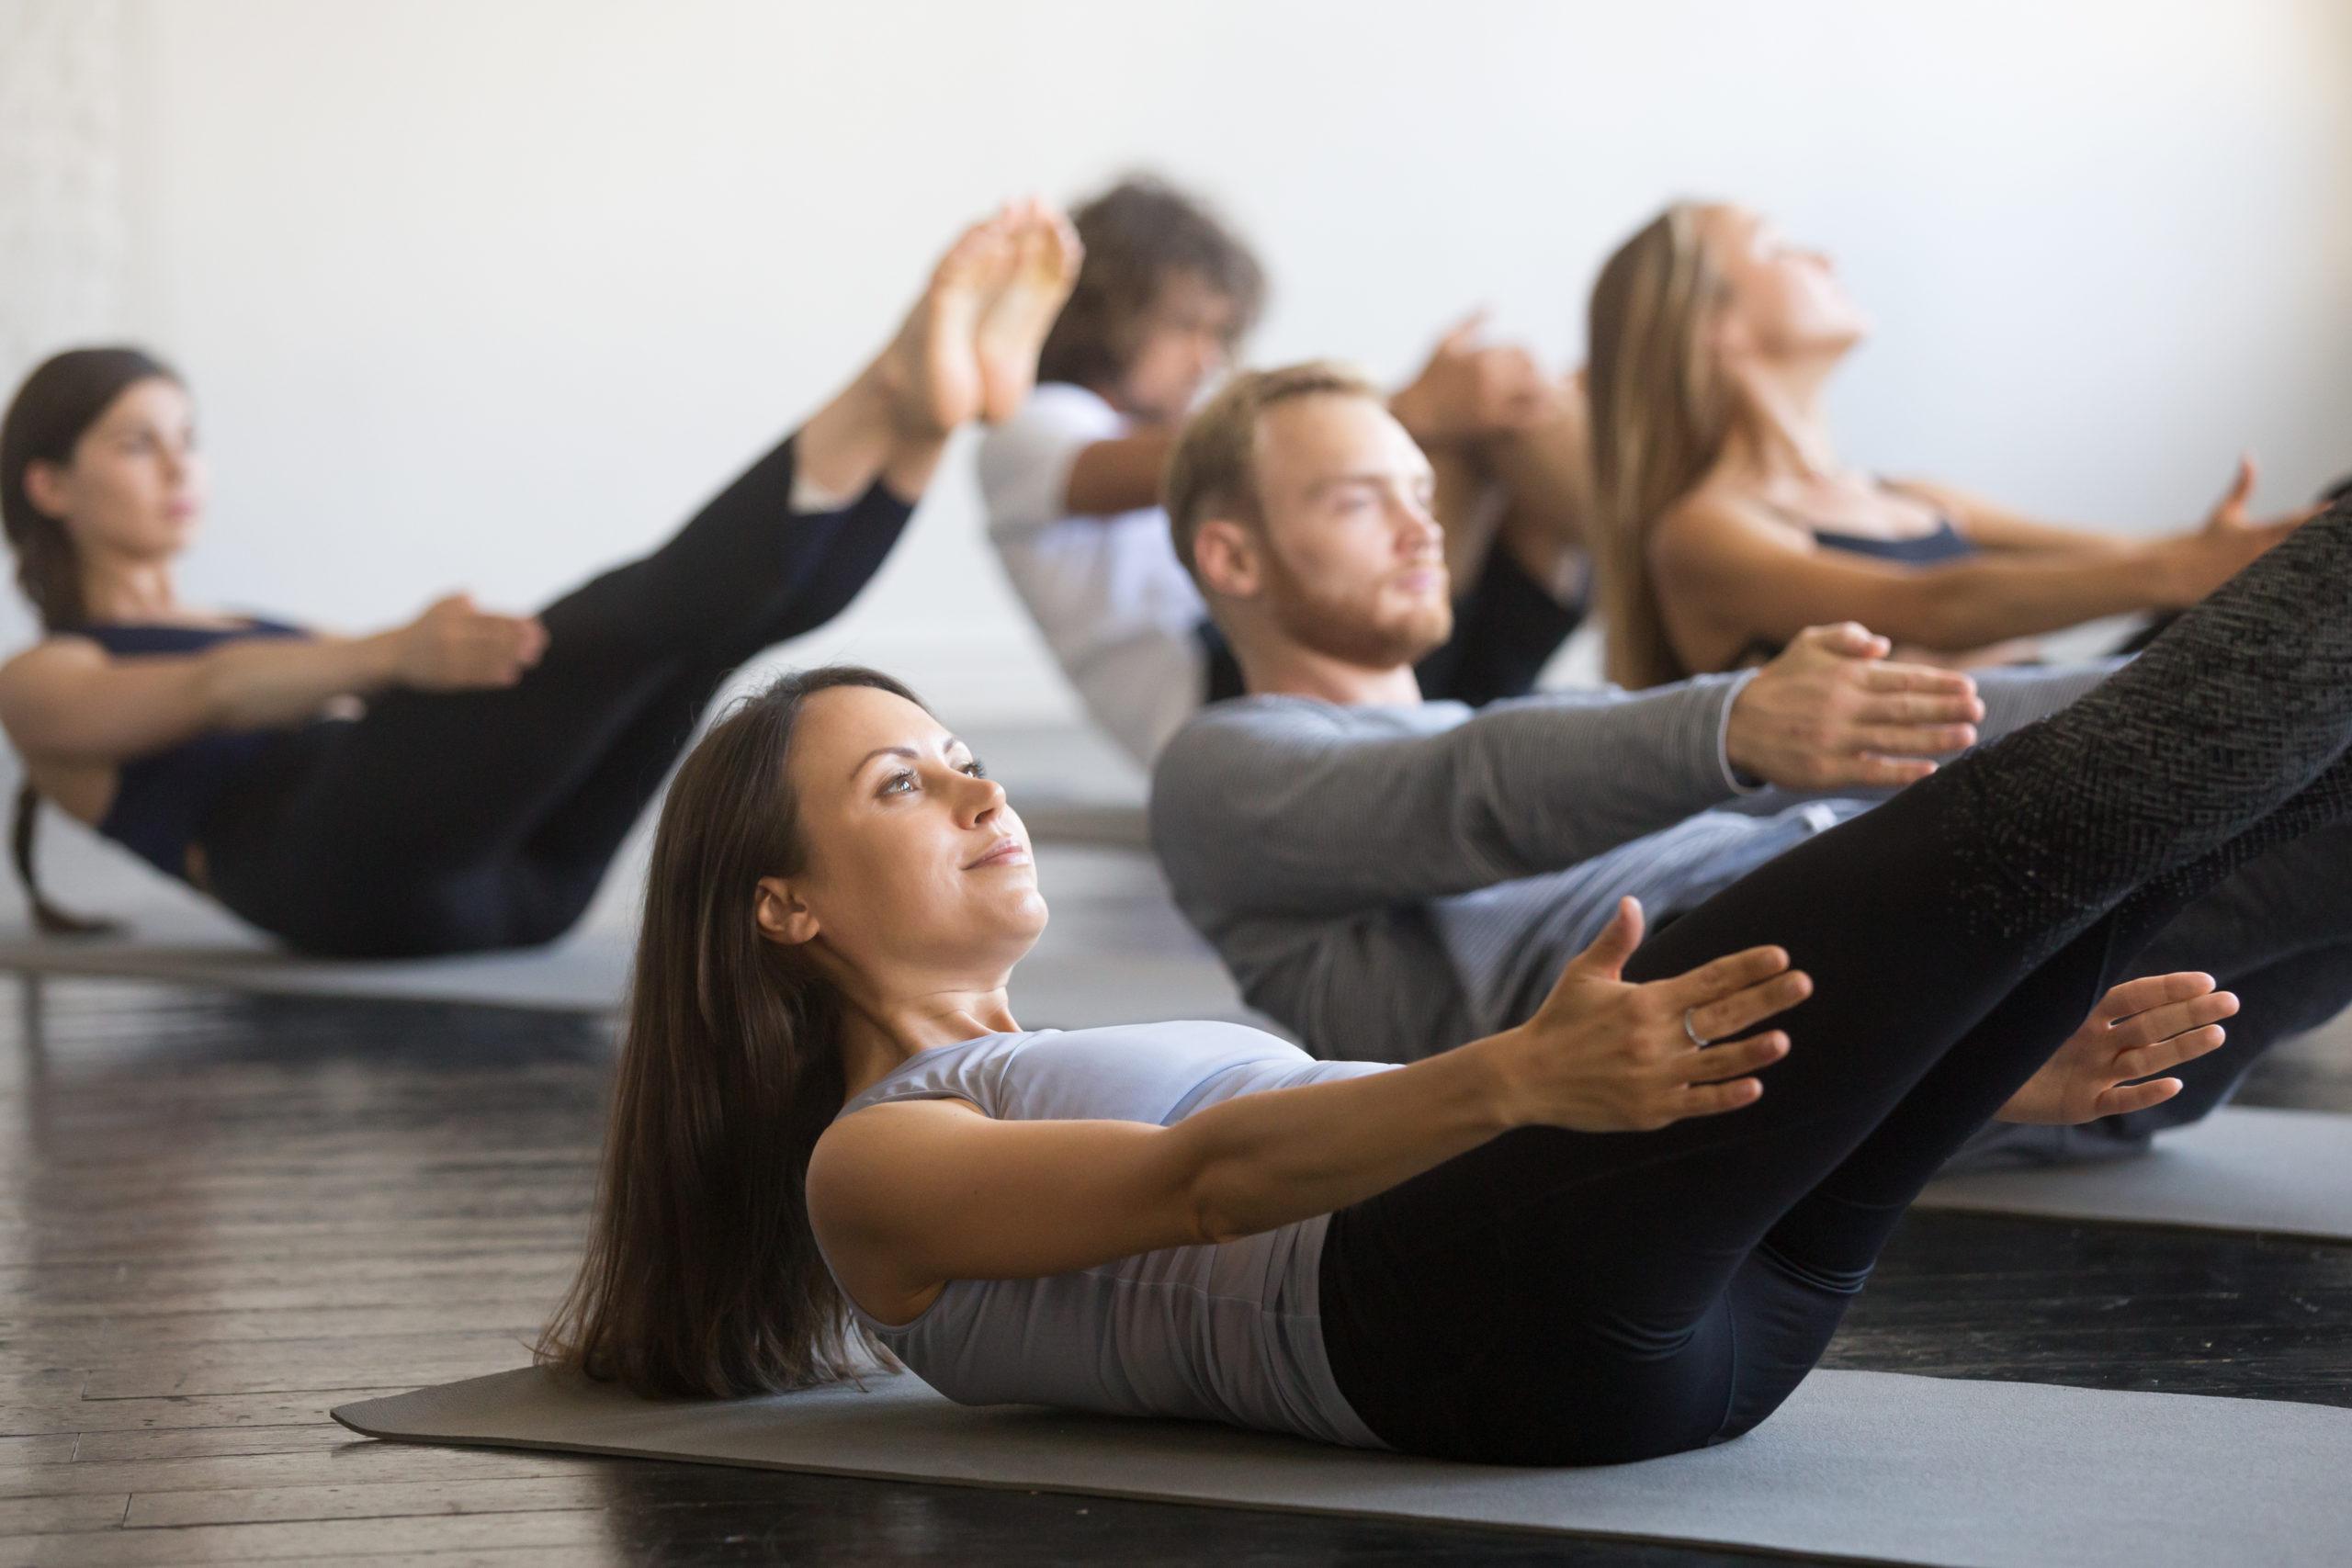 mat pilates class details truself sporting club image